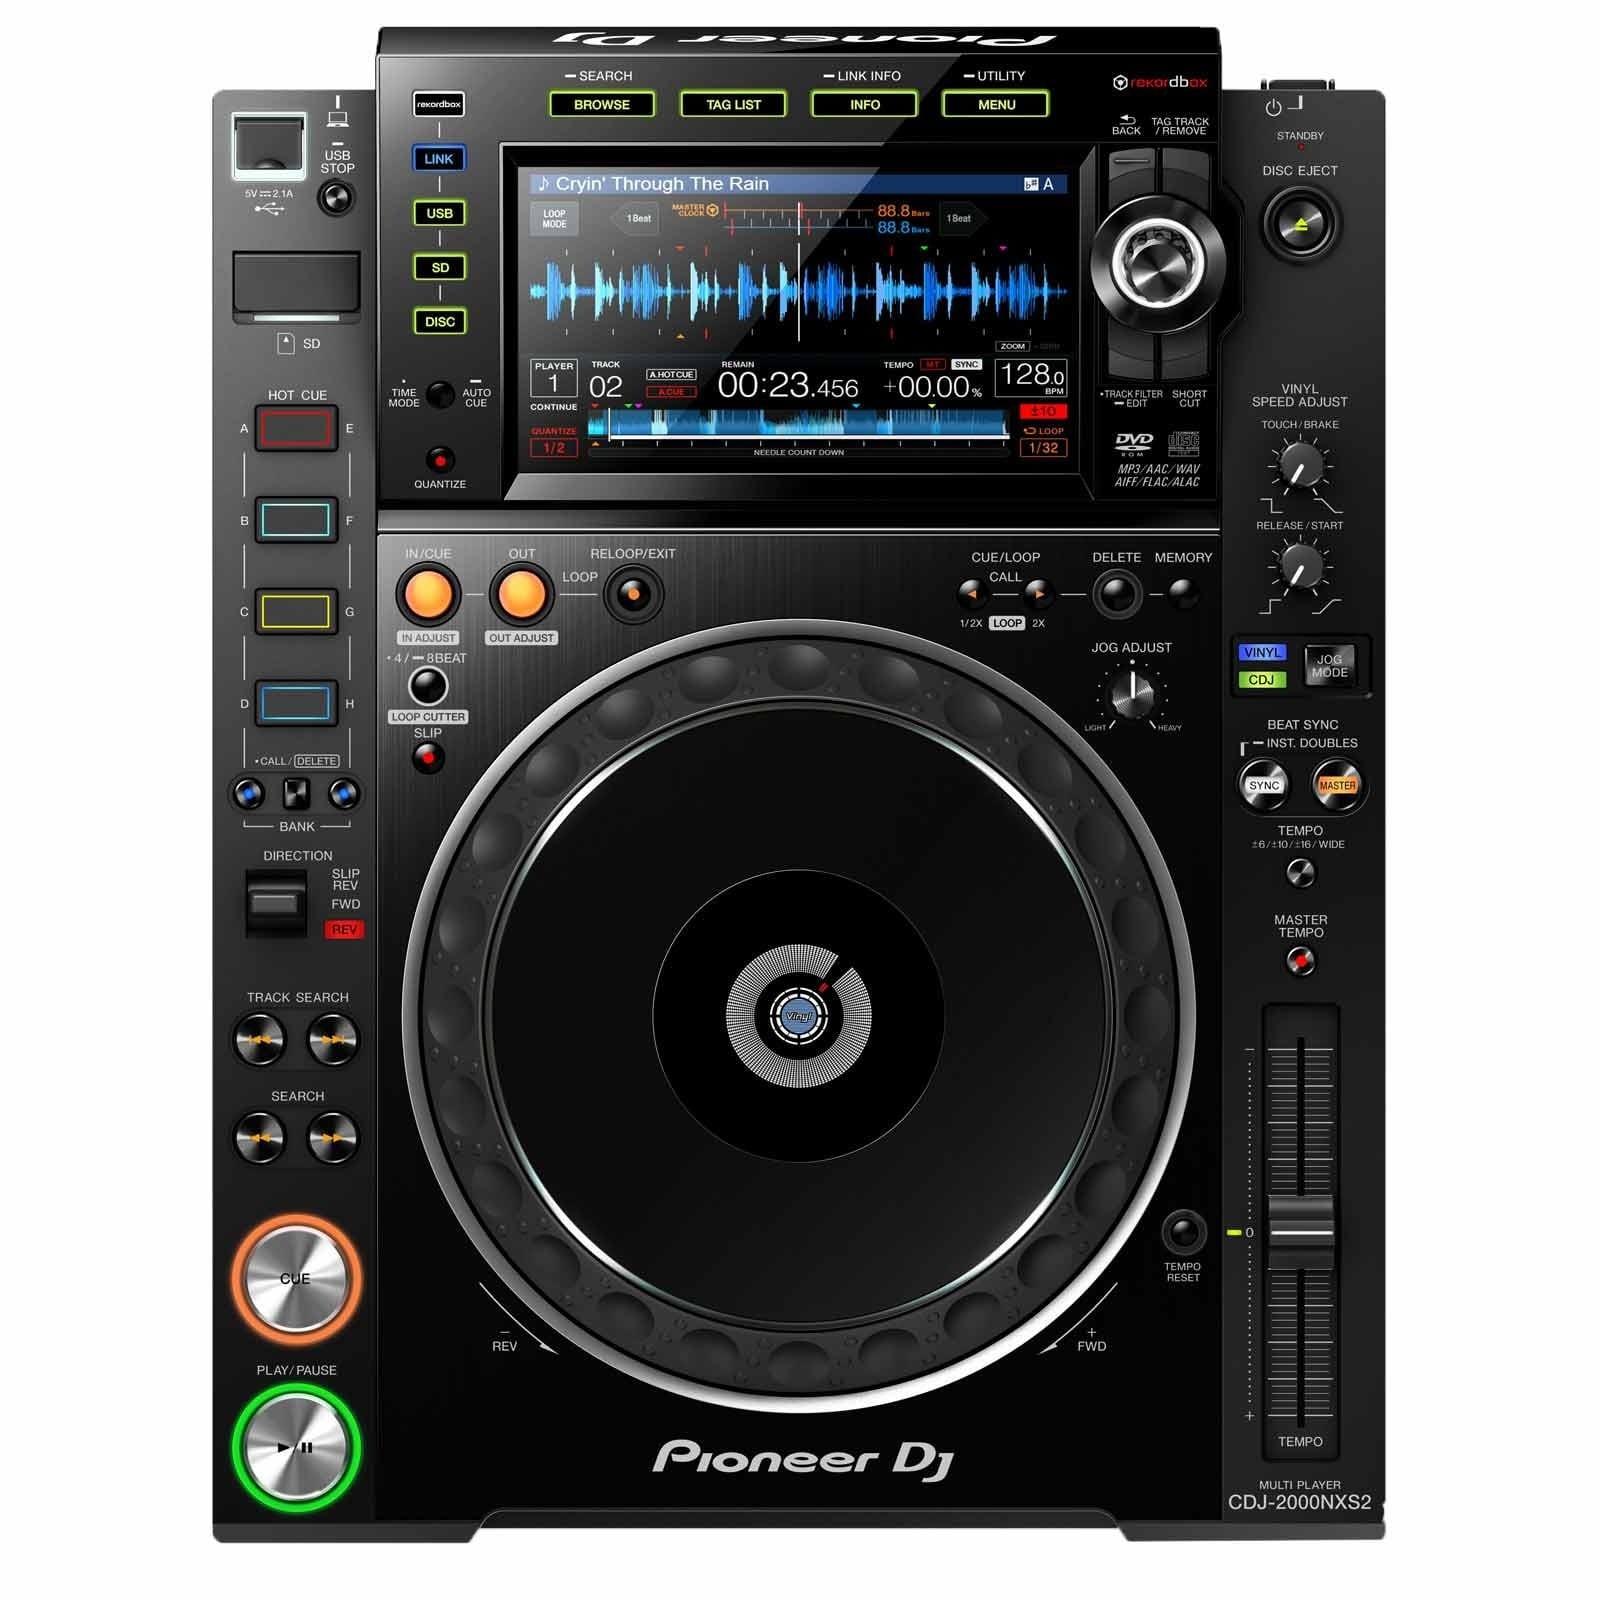 pioneer-dj-cdj-2000nxs2-pro-dj-multi-player-with-high-resolution-audio-support-1d4.jpg